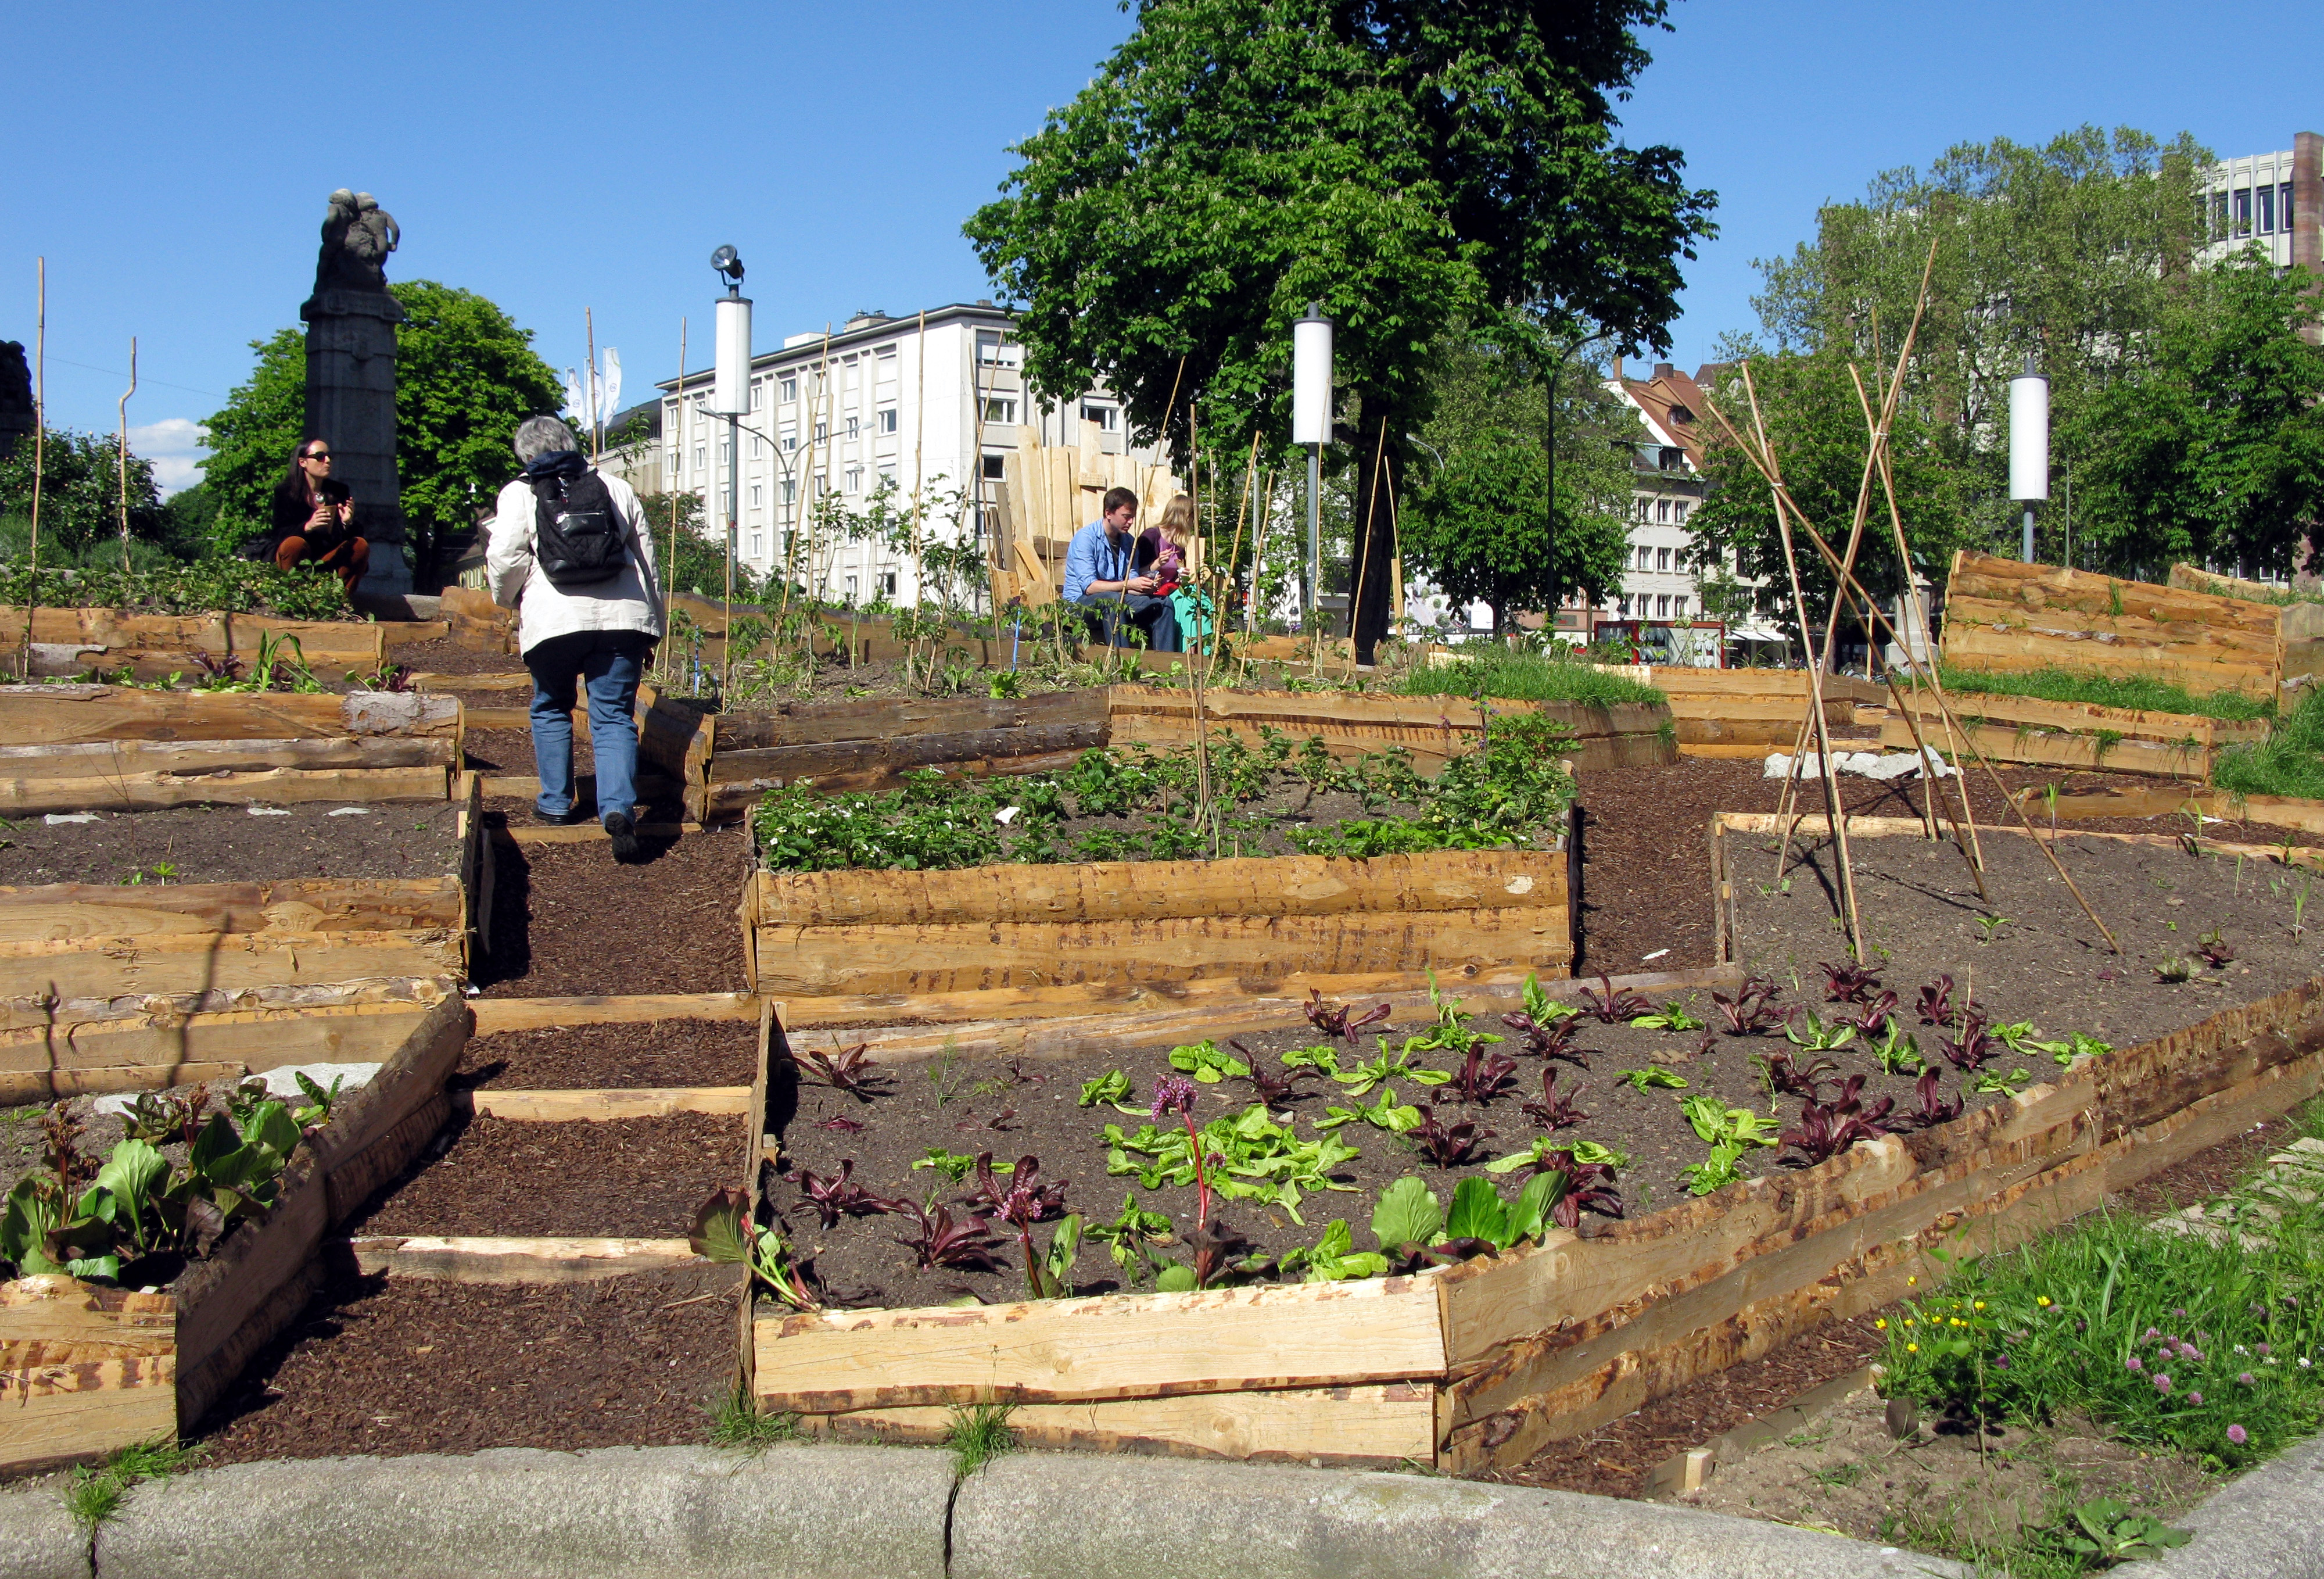 file urban gardening vor dem theater wikimedia commons. Black Bedroom Furniture Sets. Home Design Ideas